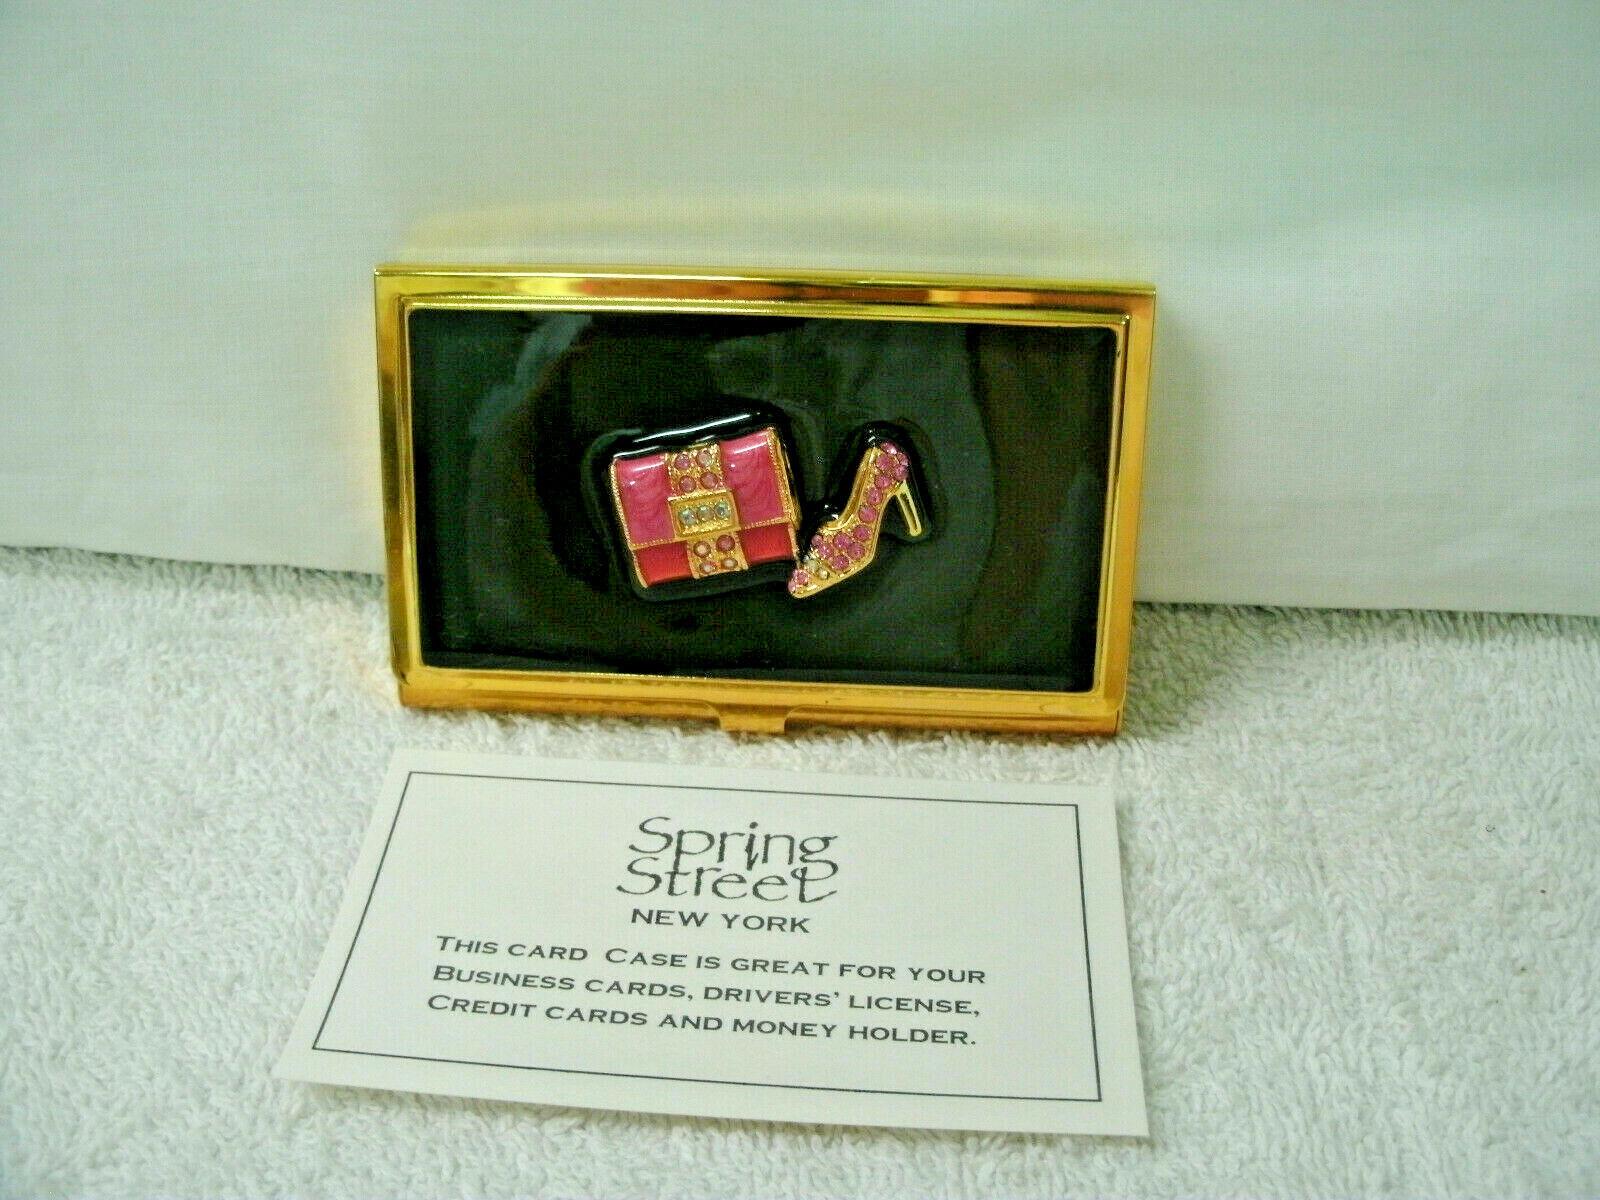 BUSINESS CARD HOLDER by Spring Street--**Shoe/Handbag** Theme---NEW